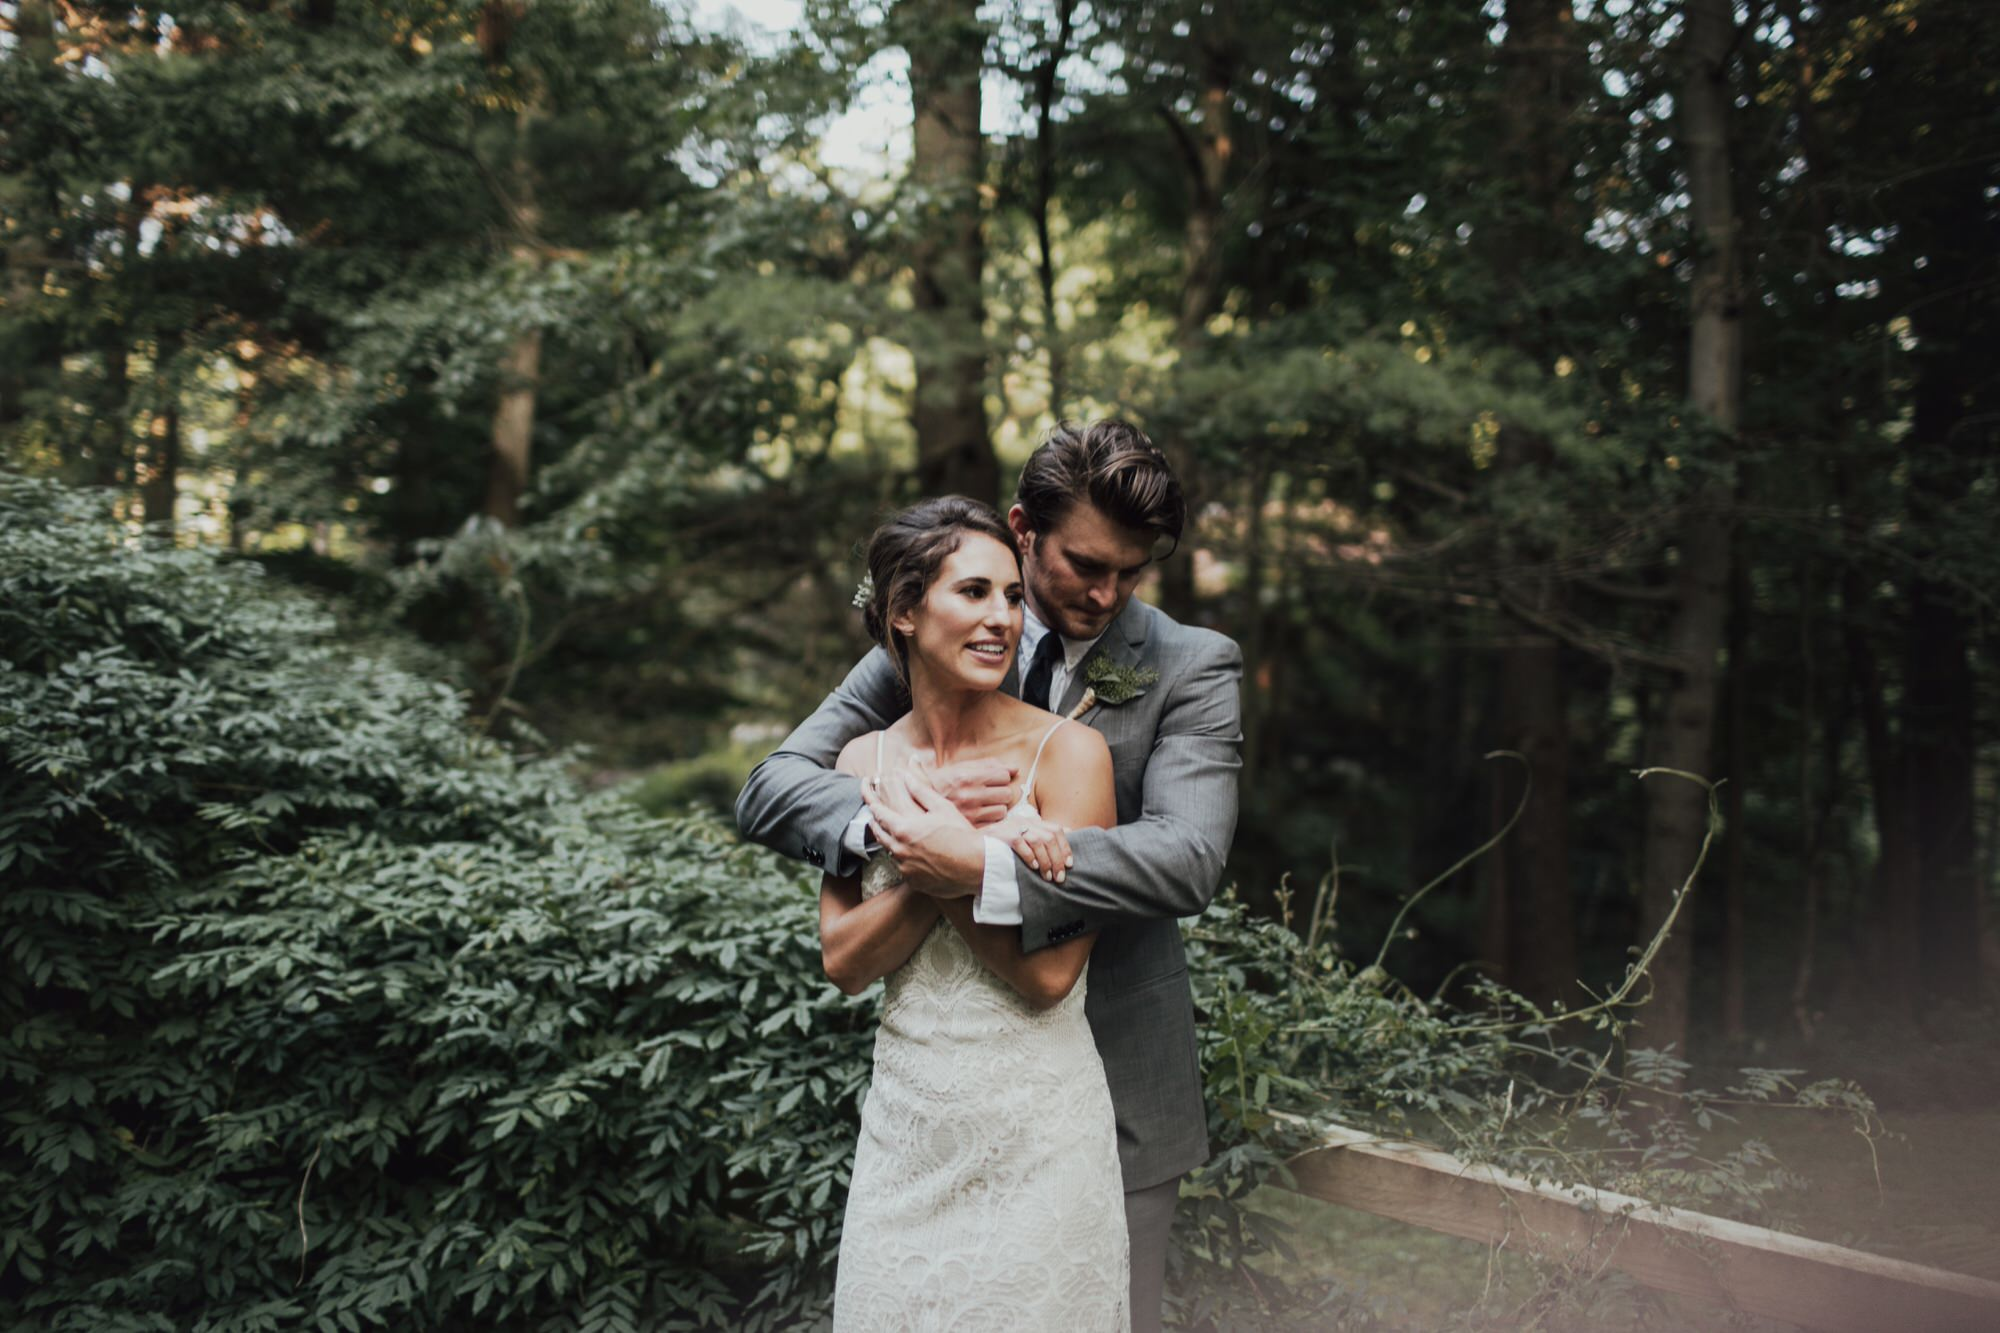 emily-aaron-rochester-new-york-wedding-photographer-101.JPG